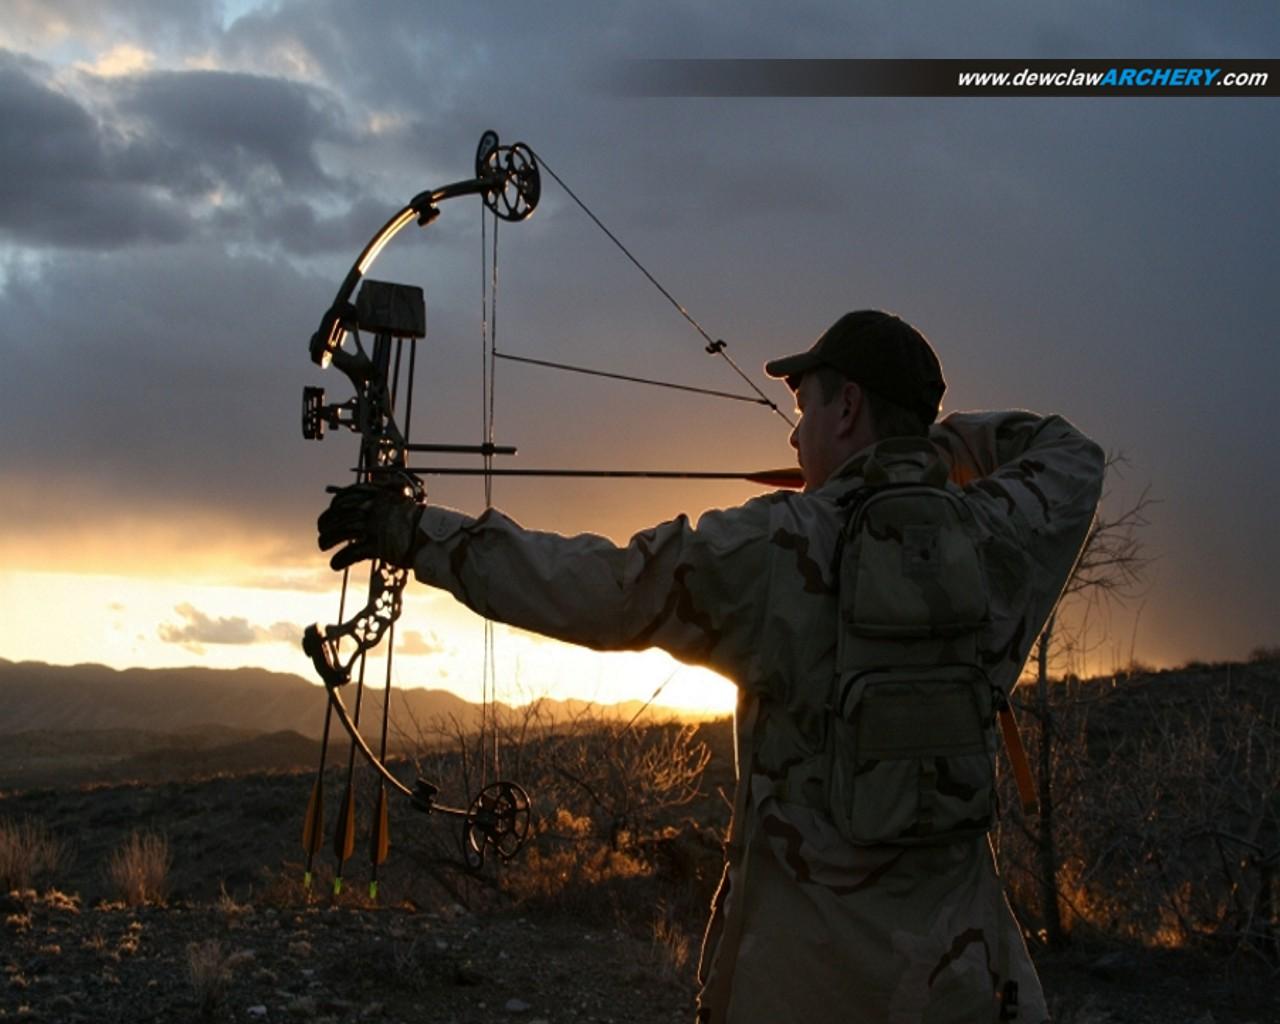 archery wallpaper desktop - photo #27